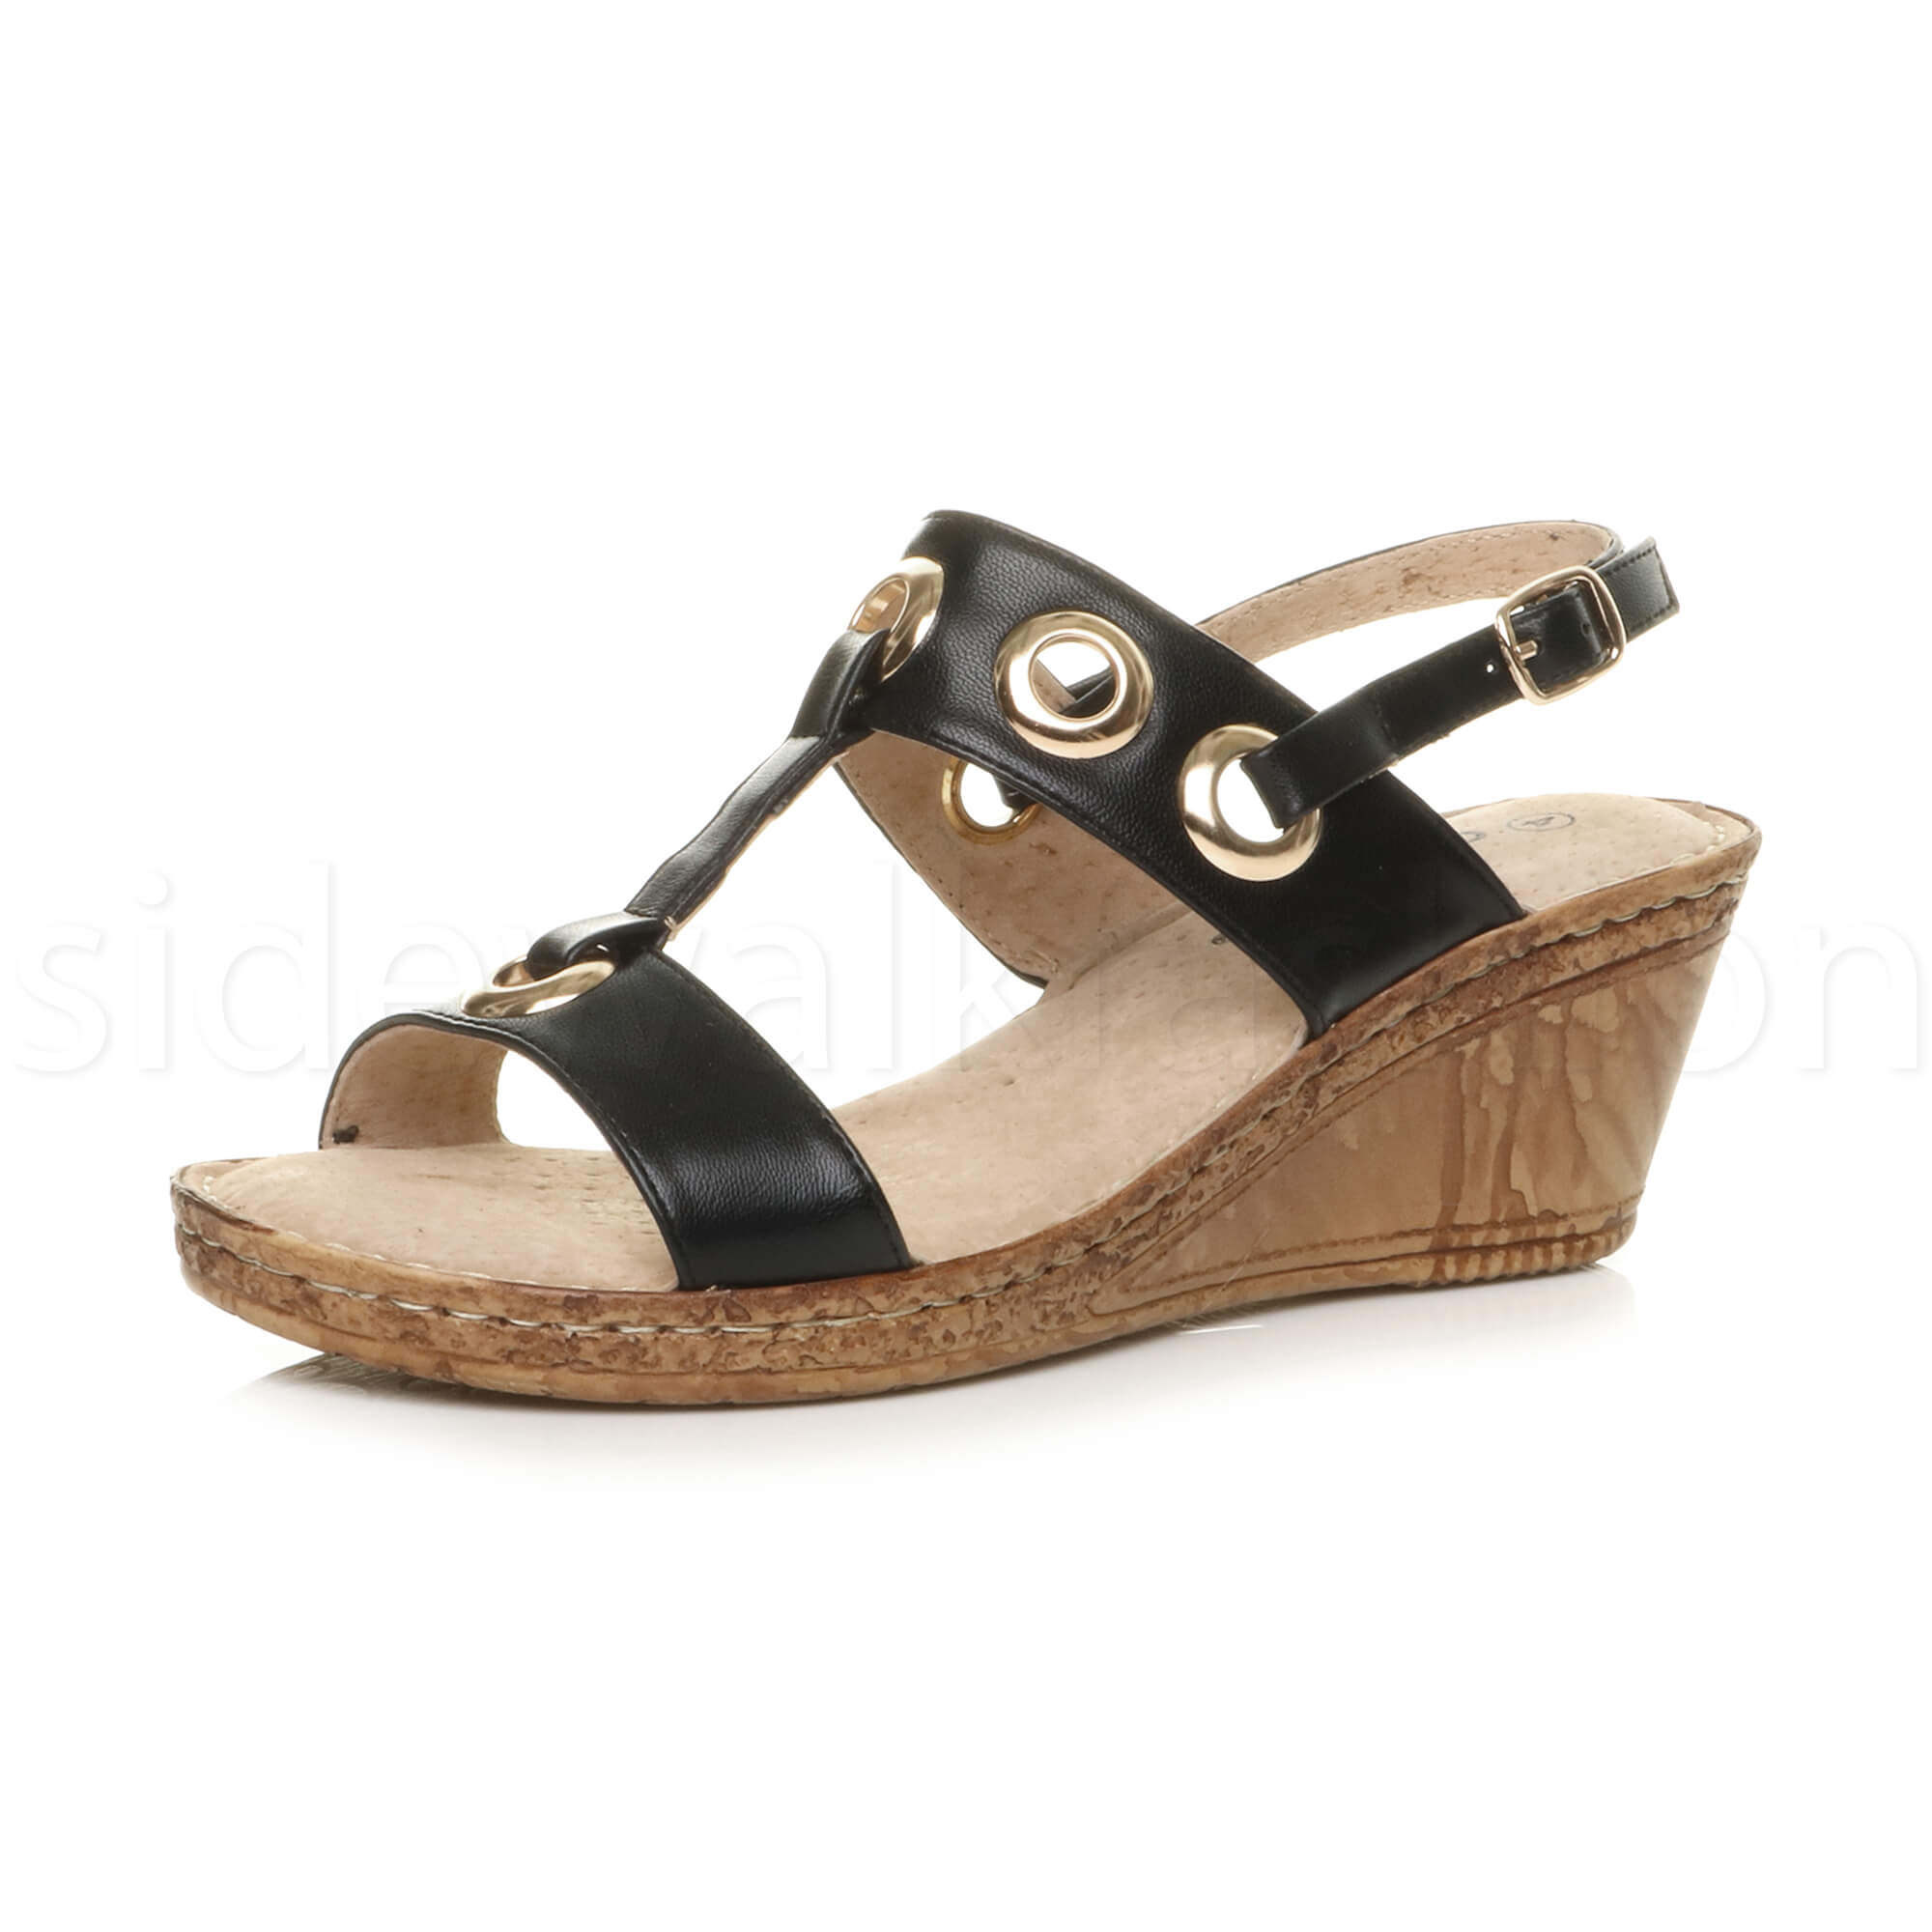 comfort sandals schuler comforter shoes wedge at footwear